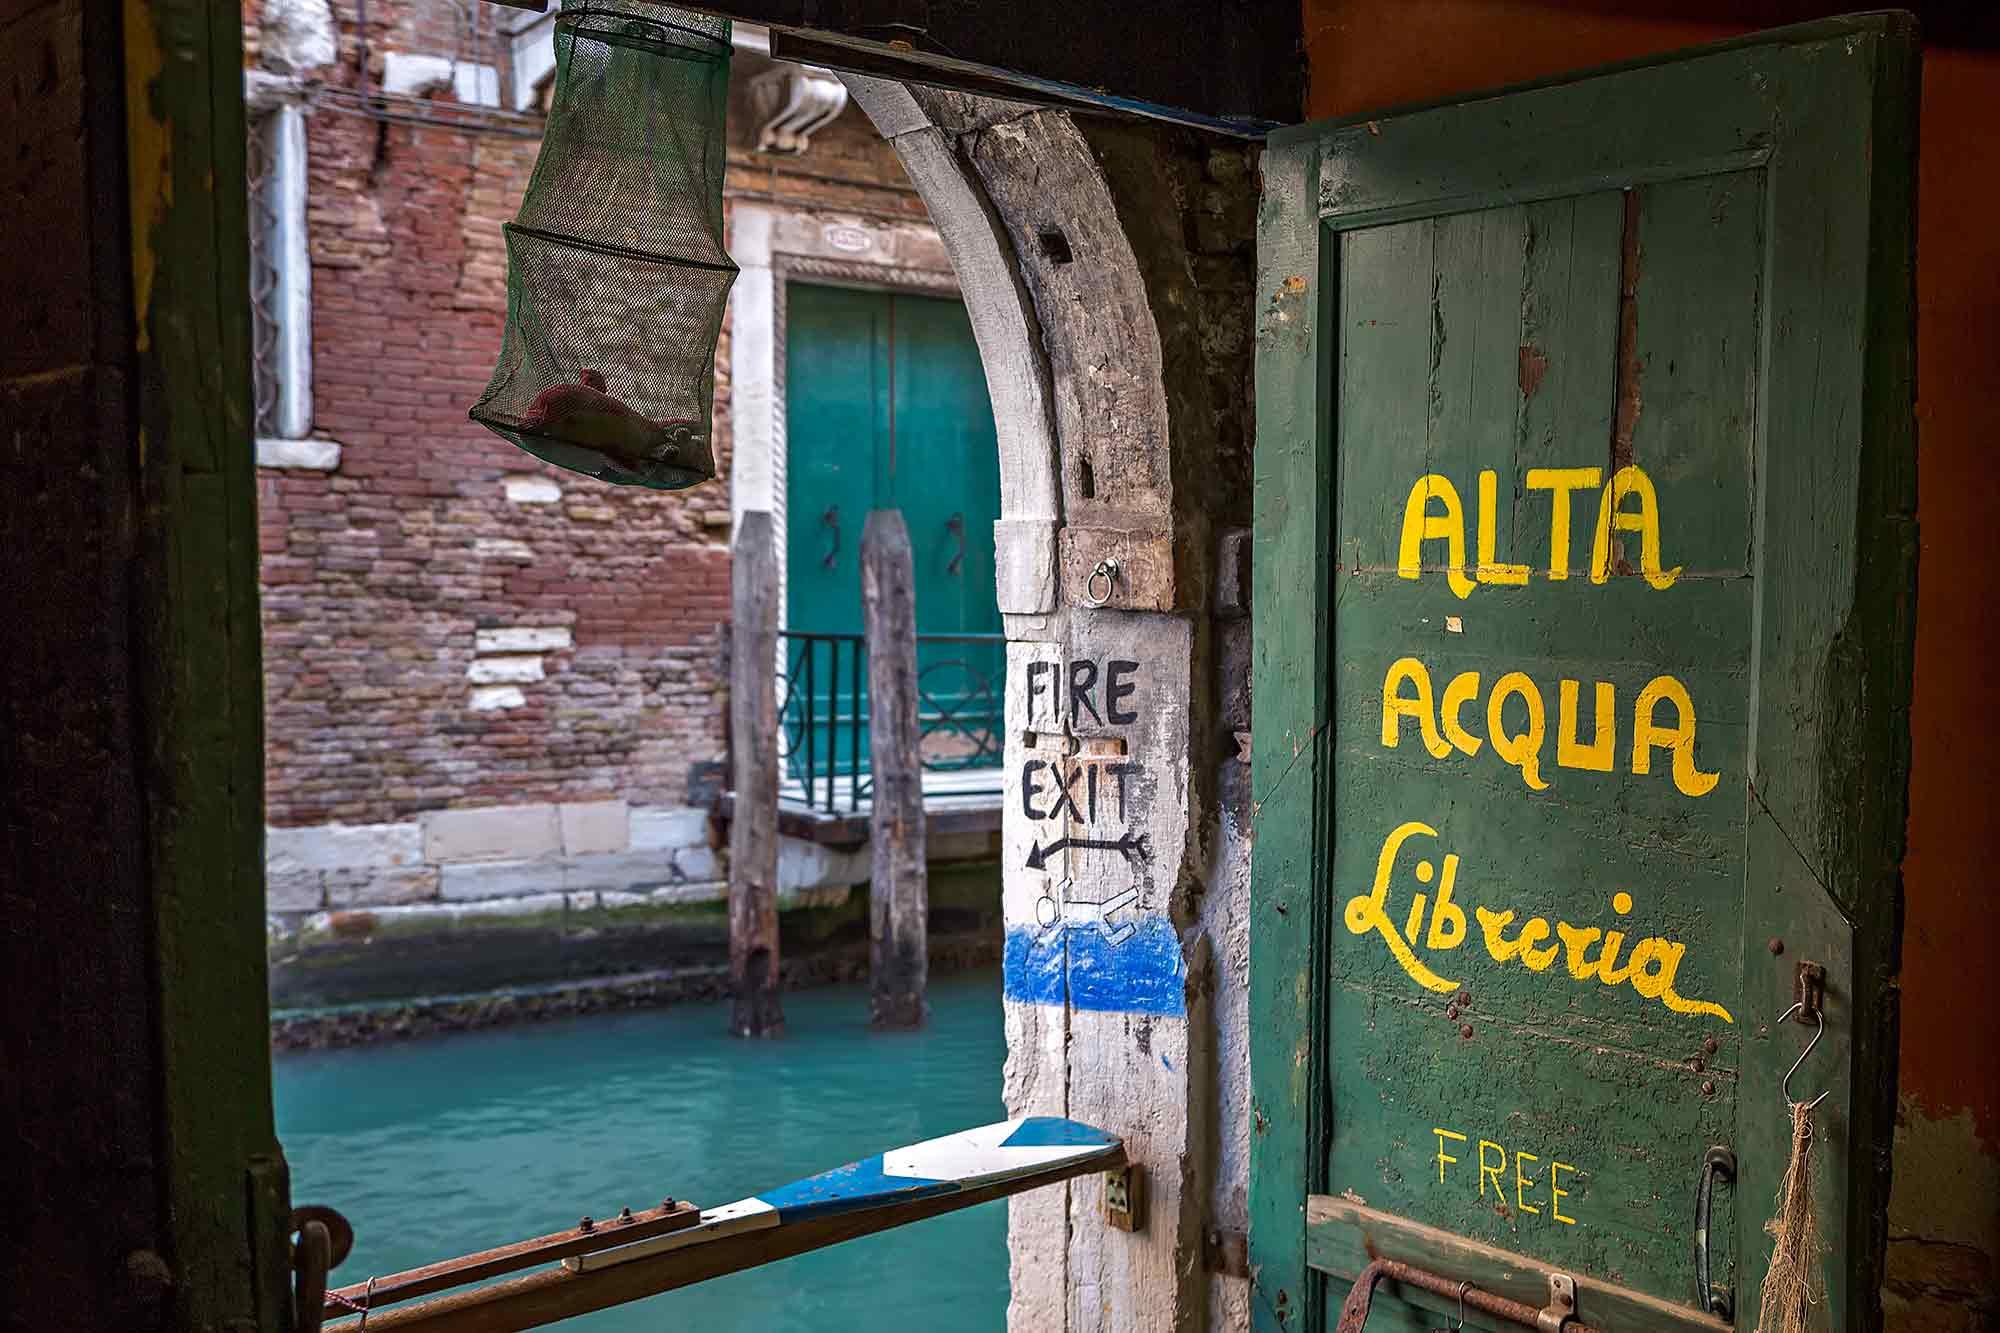 Libreria Acqua Alta bookstore in Venice, Italy. © Ulli Maier & Nisa Maier